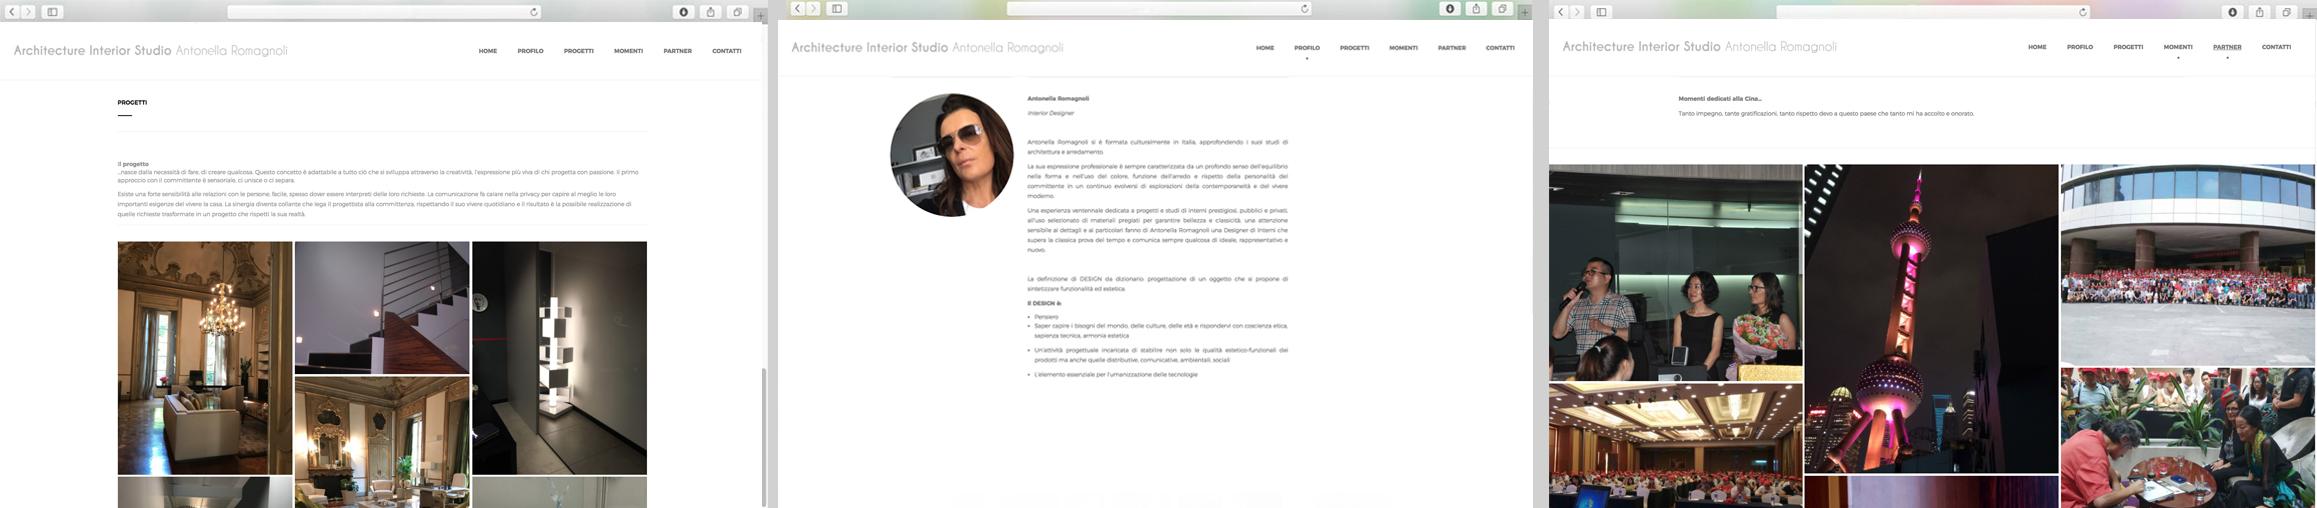 sito internet san marino